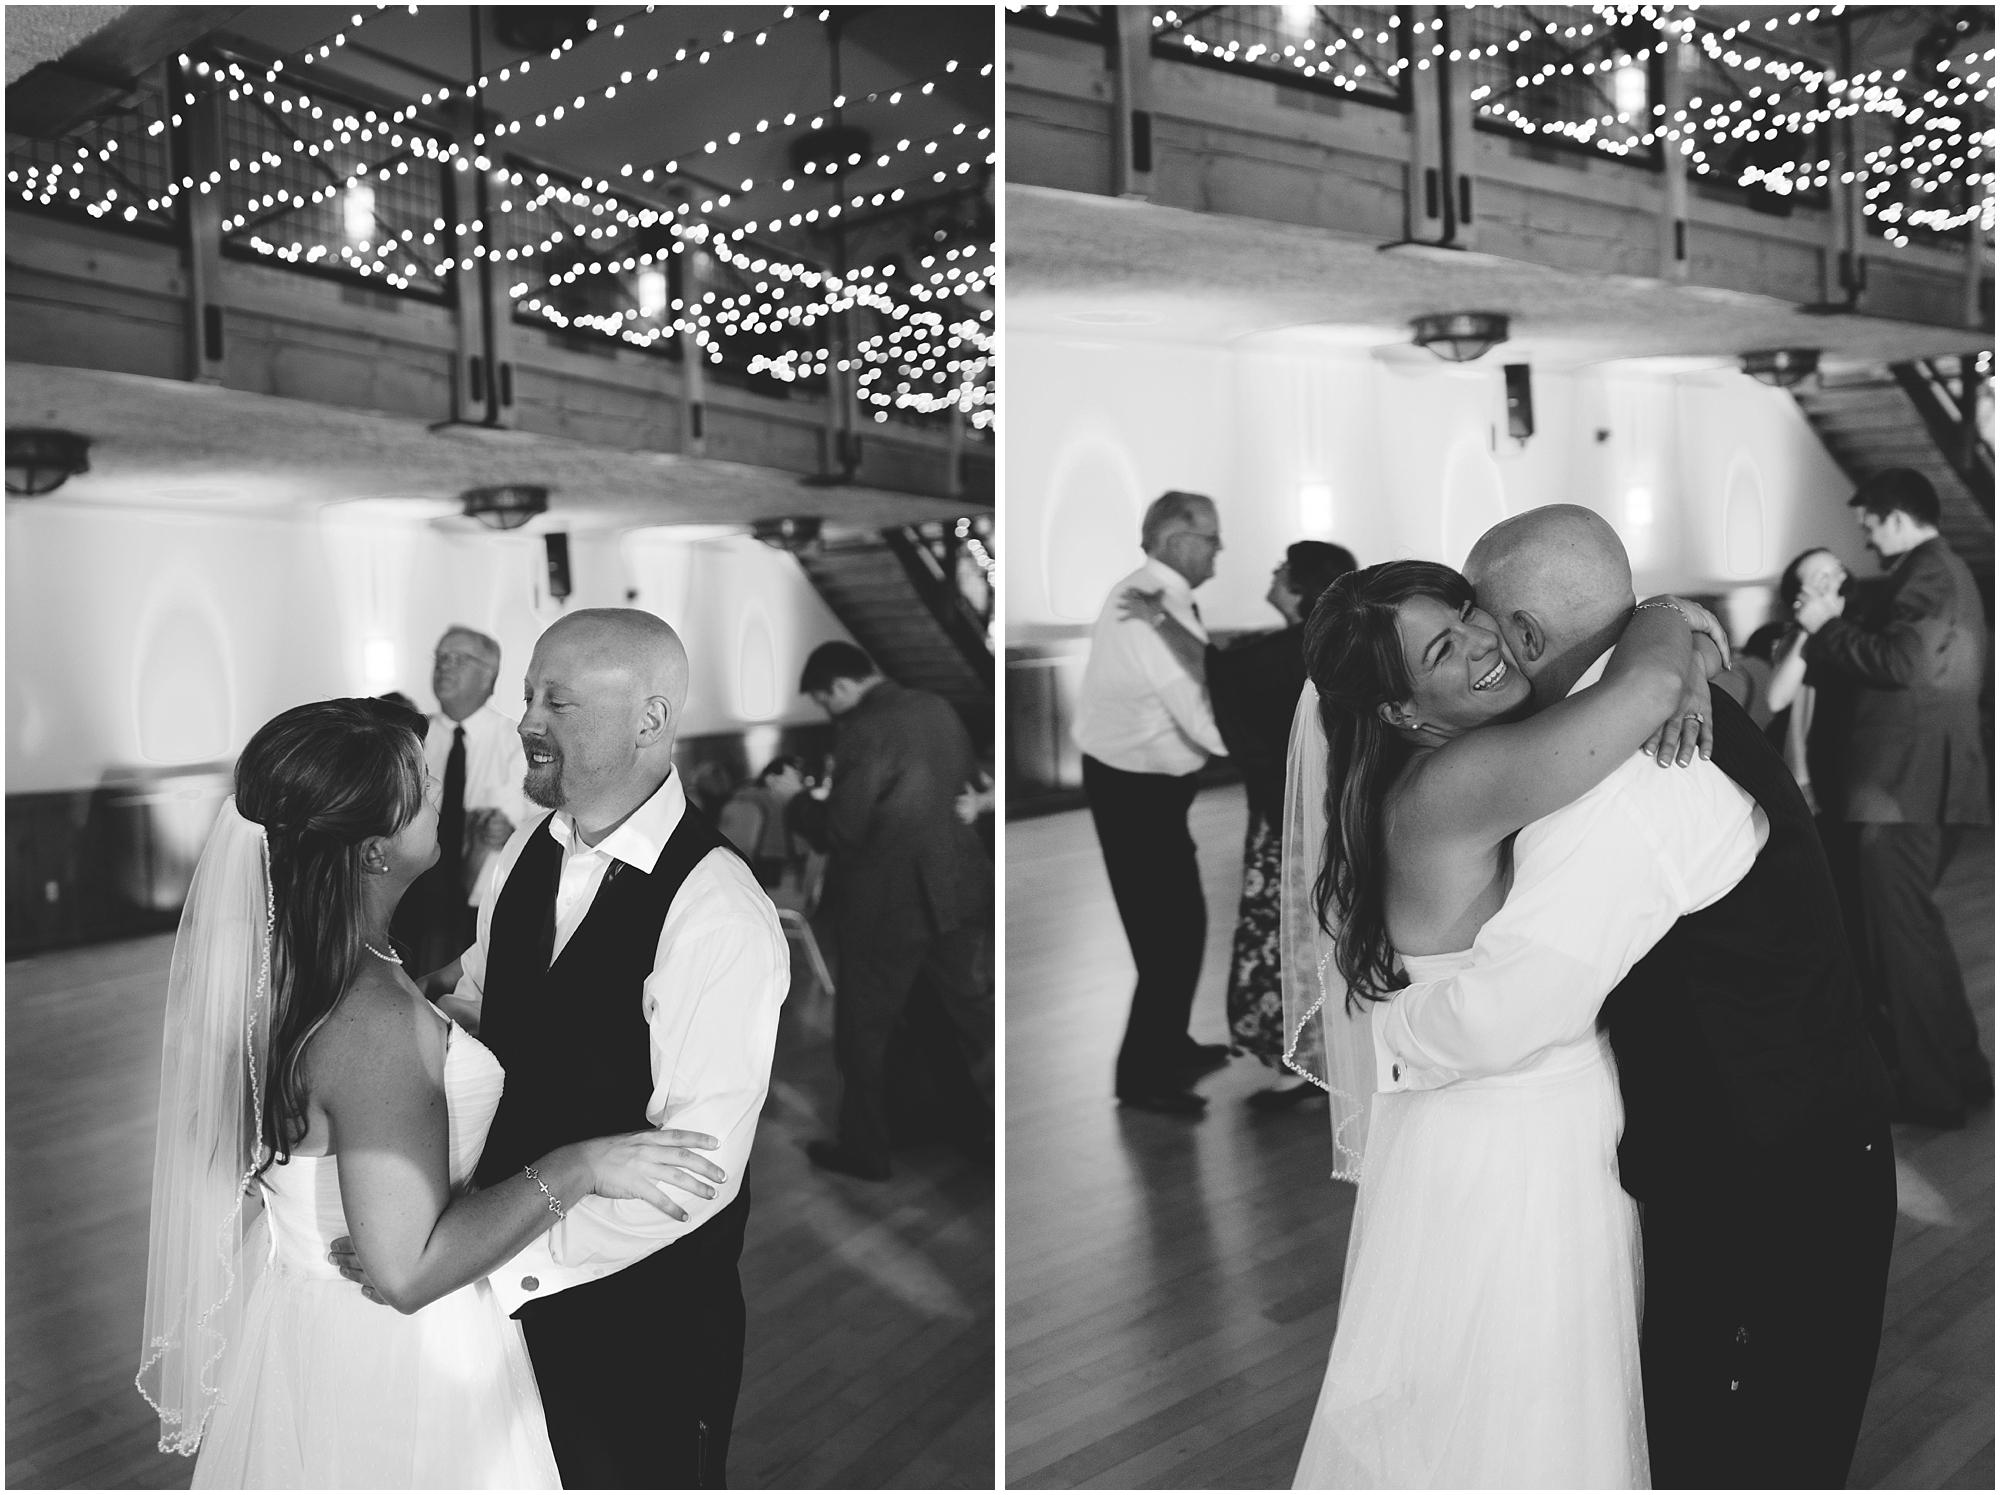 ©Taylor Powers_Shanna+Chris_Wedding_349.jpg